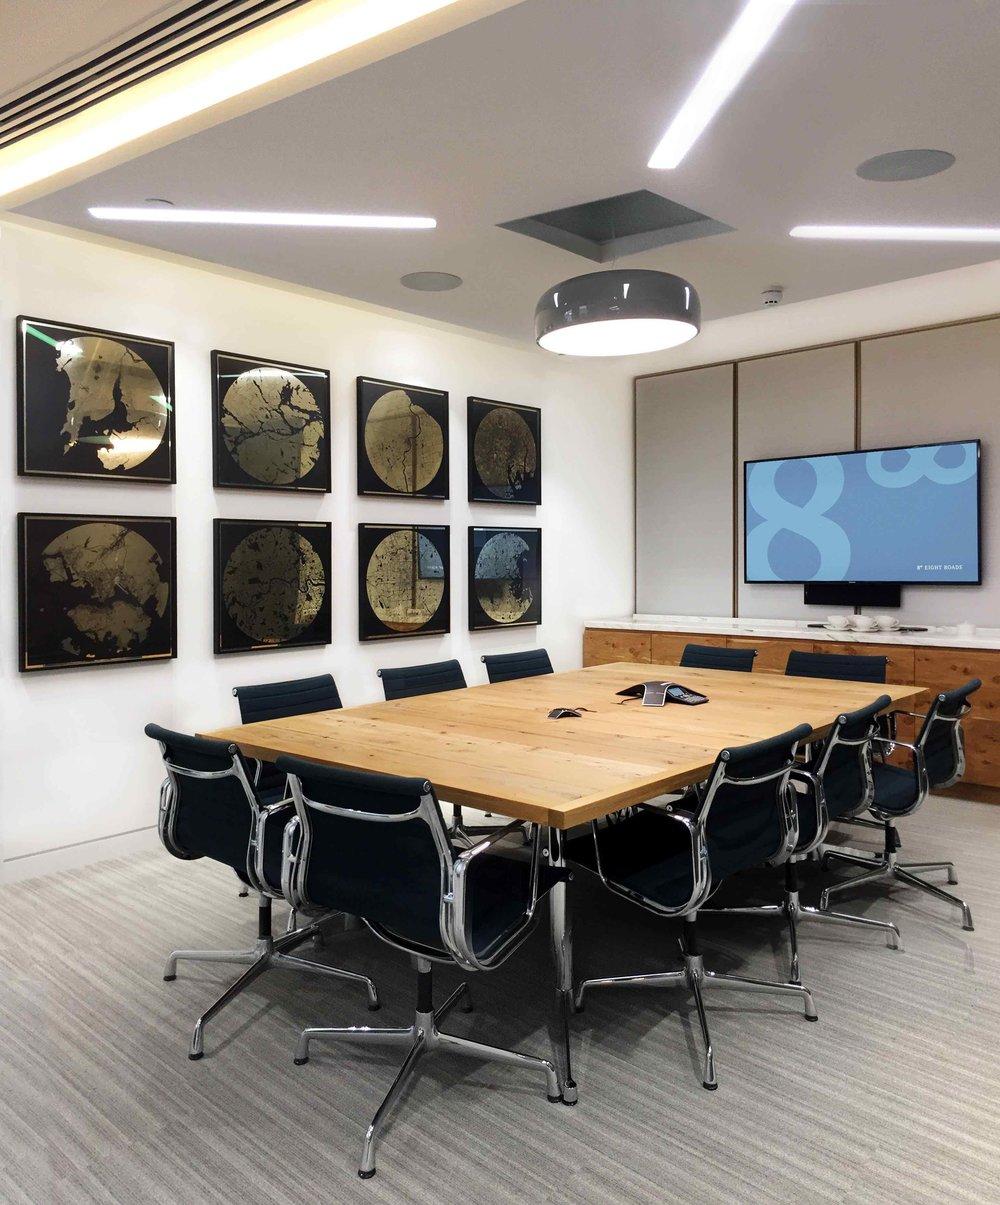 Mappa Mundi Office.jpg